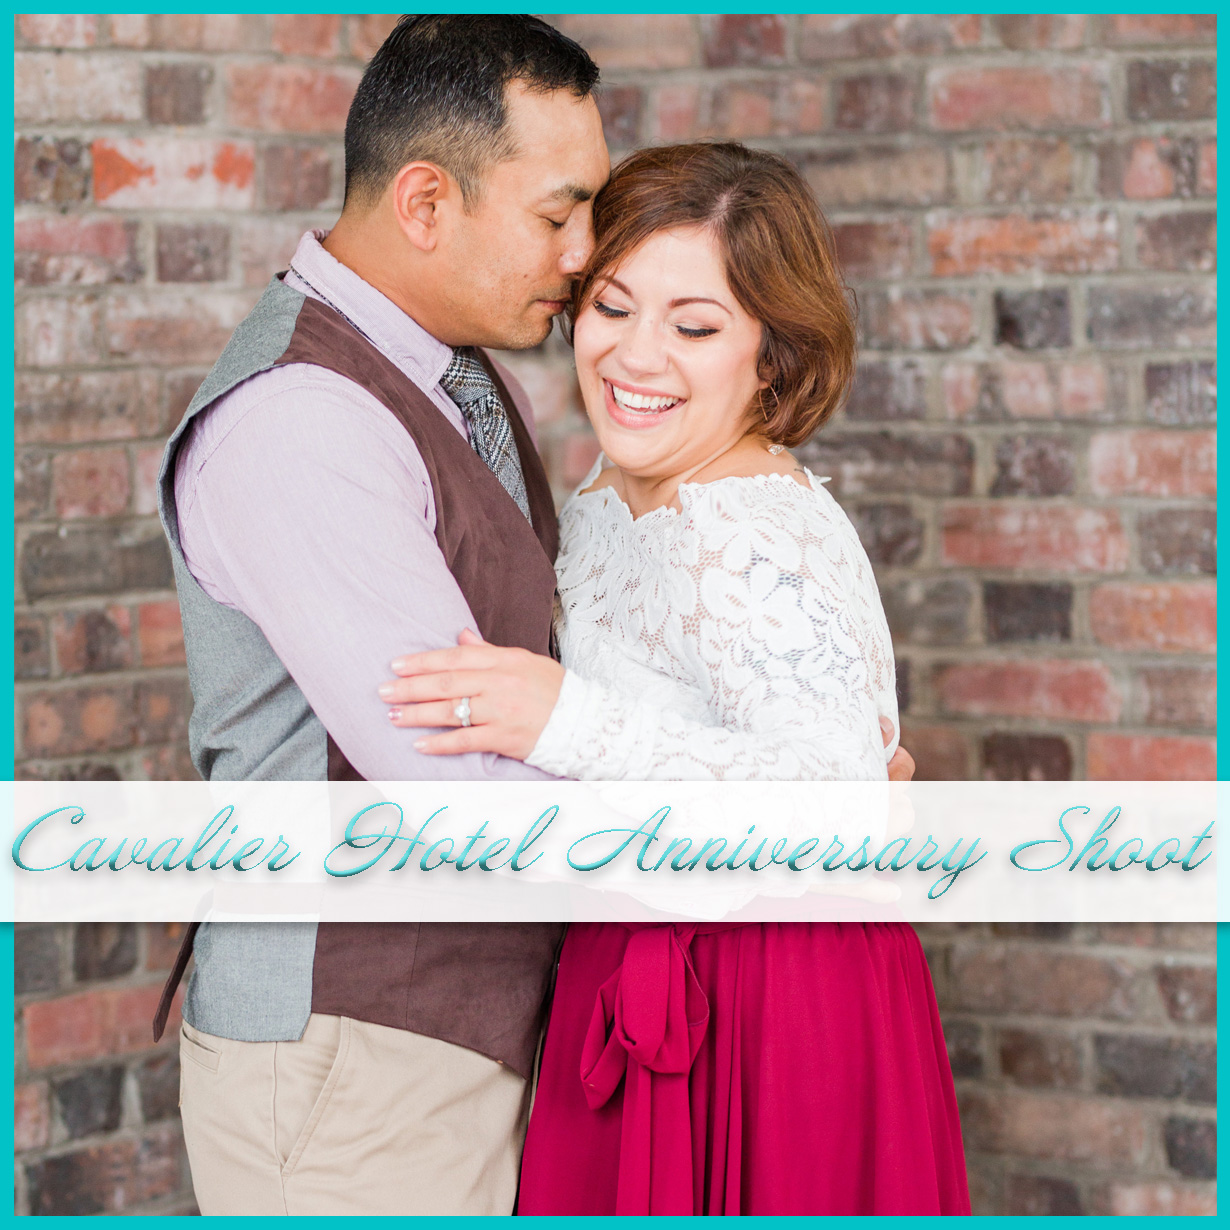 Third Wedding Anniversary at Cavalier Hotel